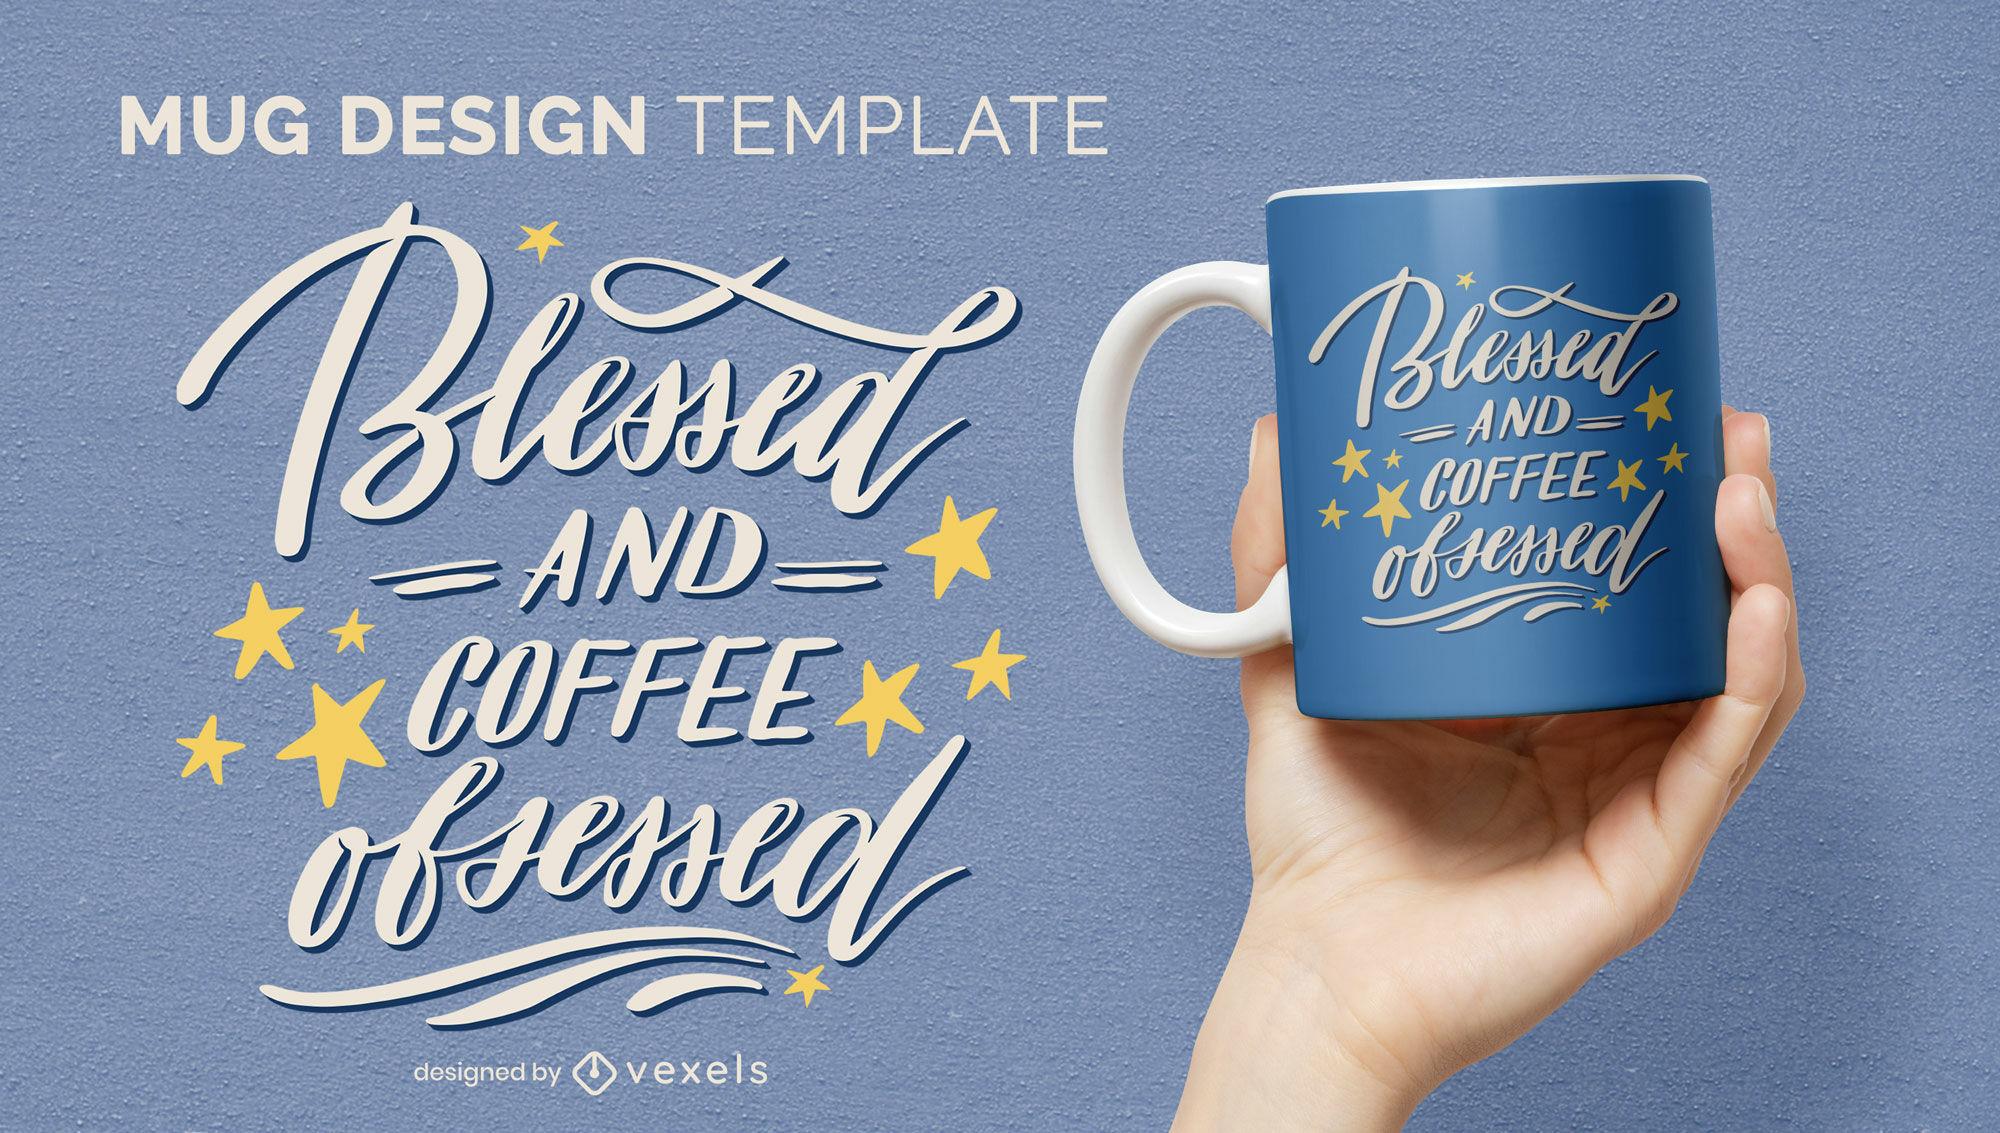 Motivational coffee quote mug design